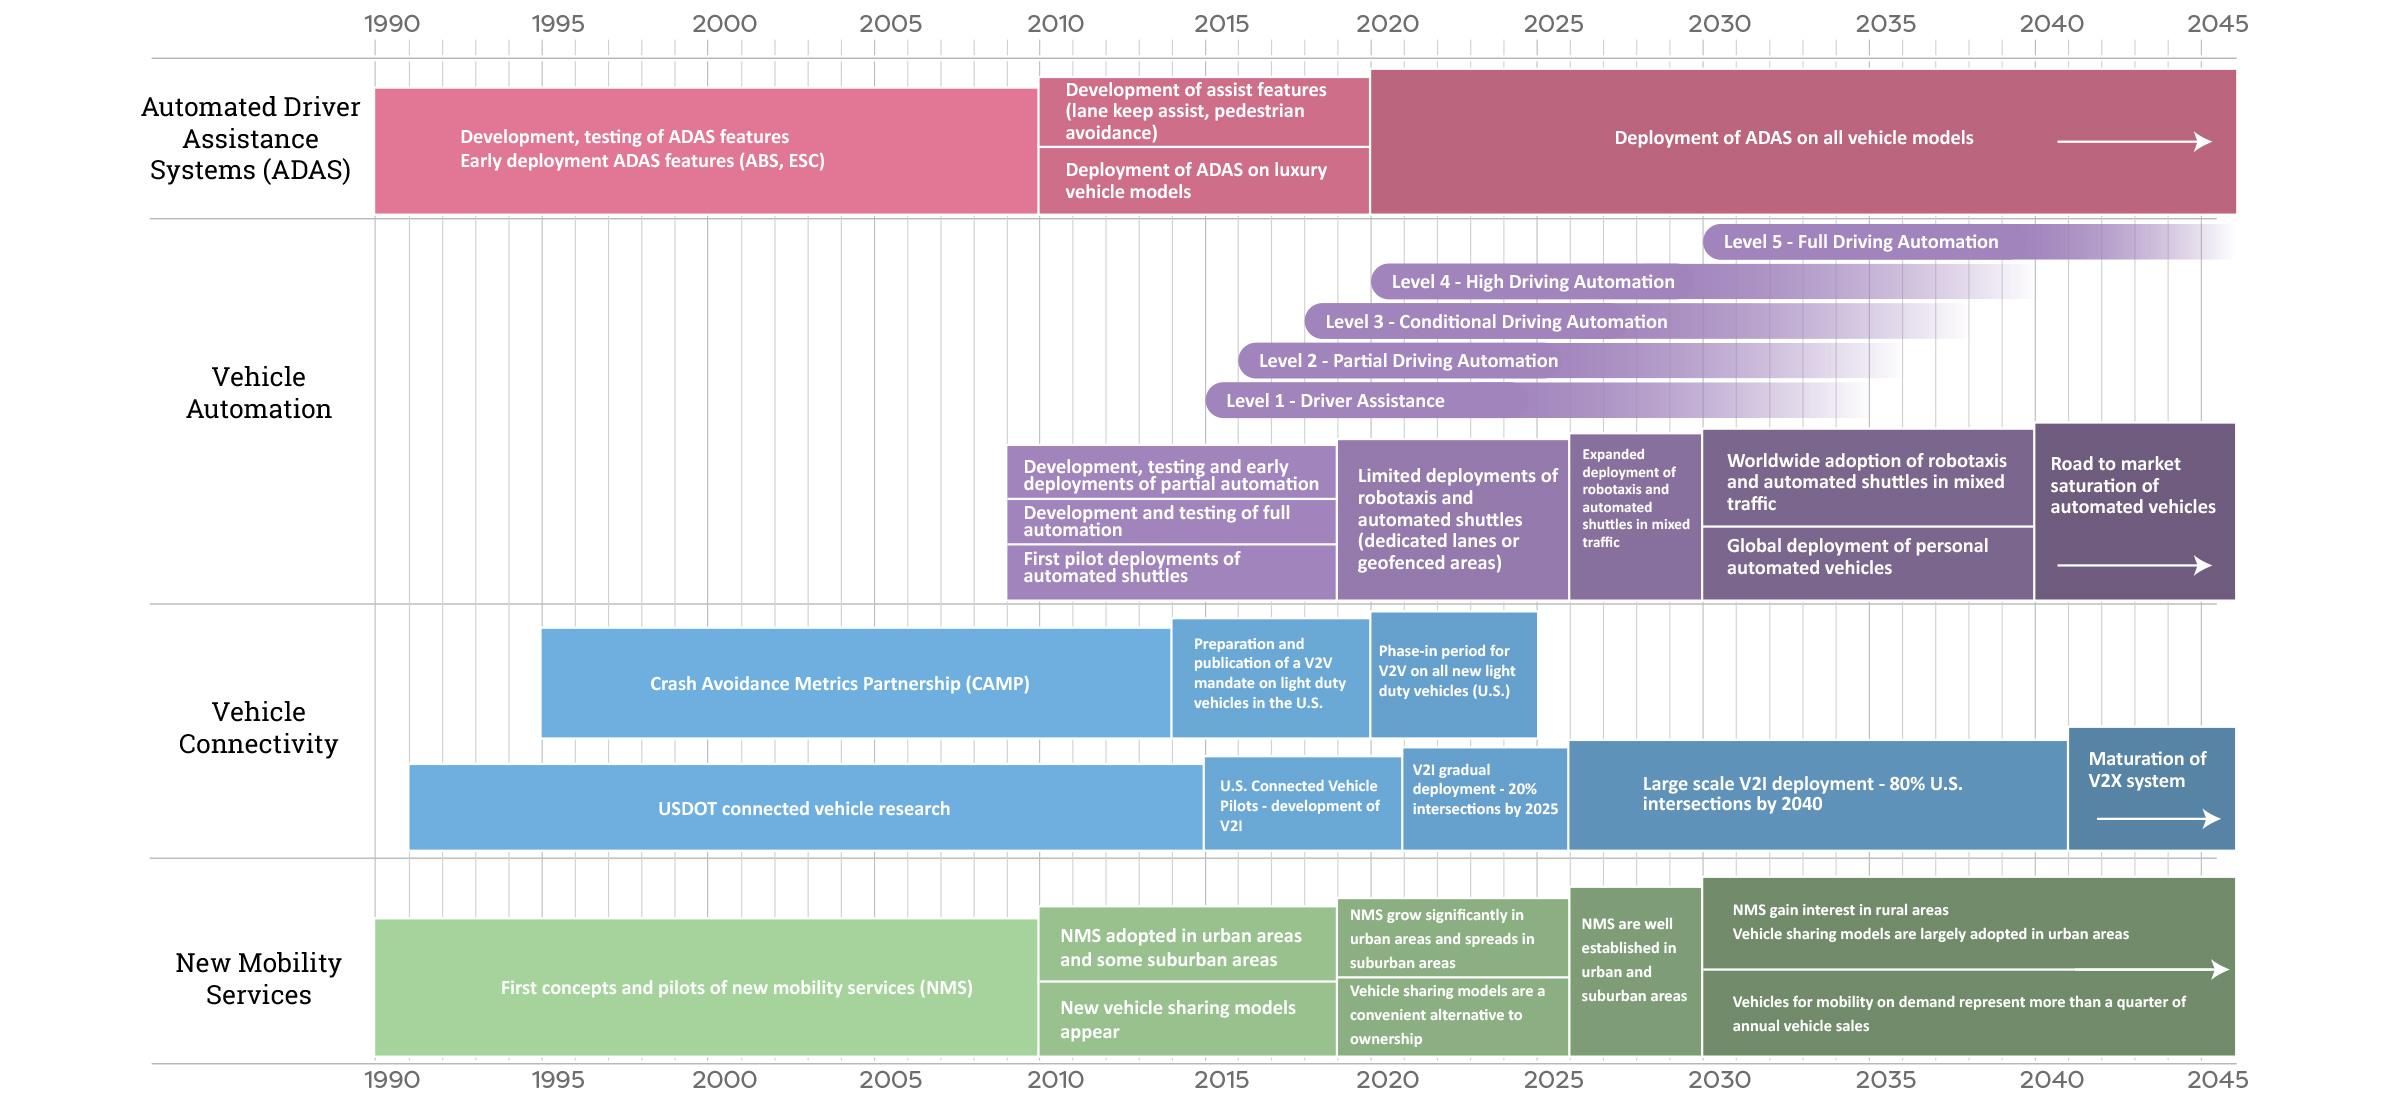 Roadmap For Automotive Technology Advancement Center For